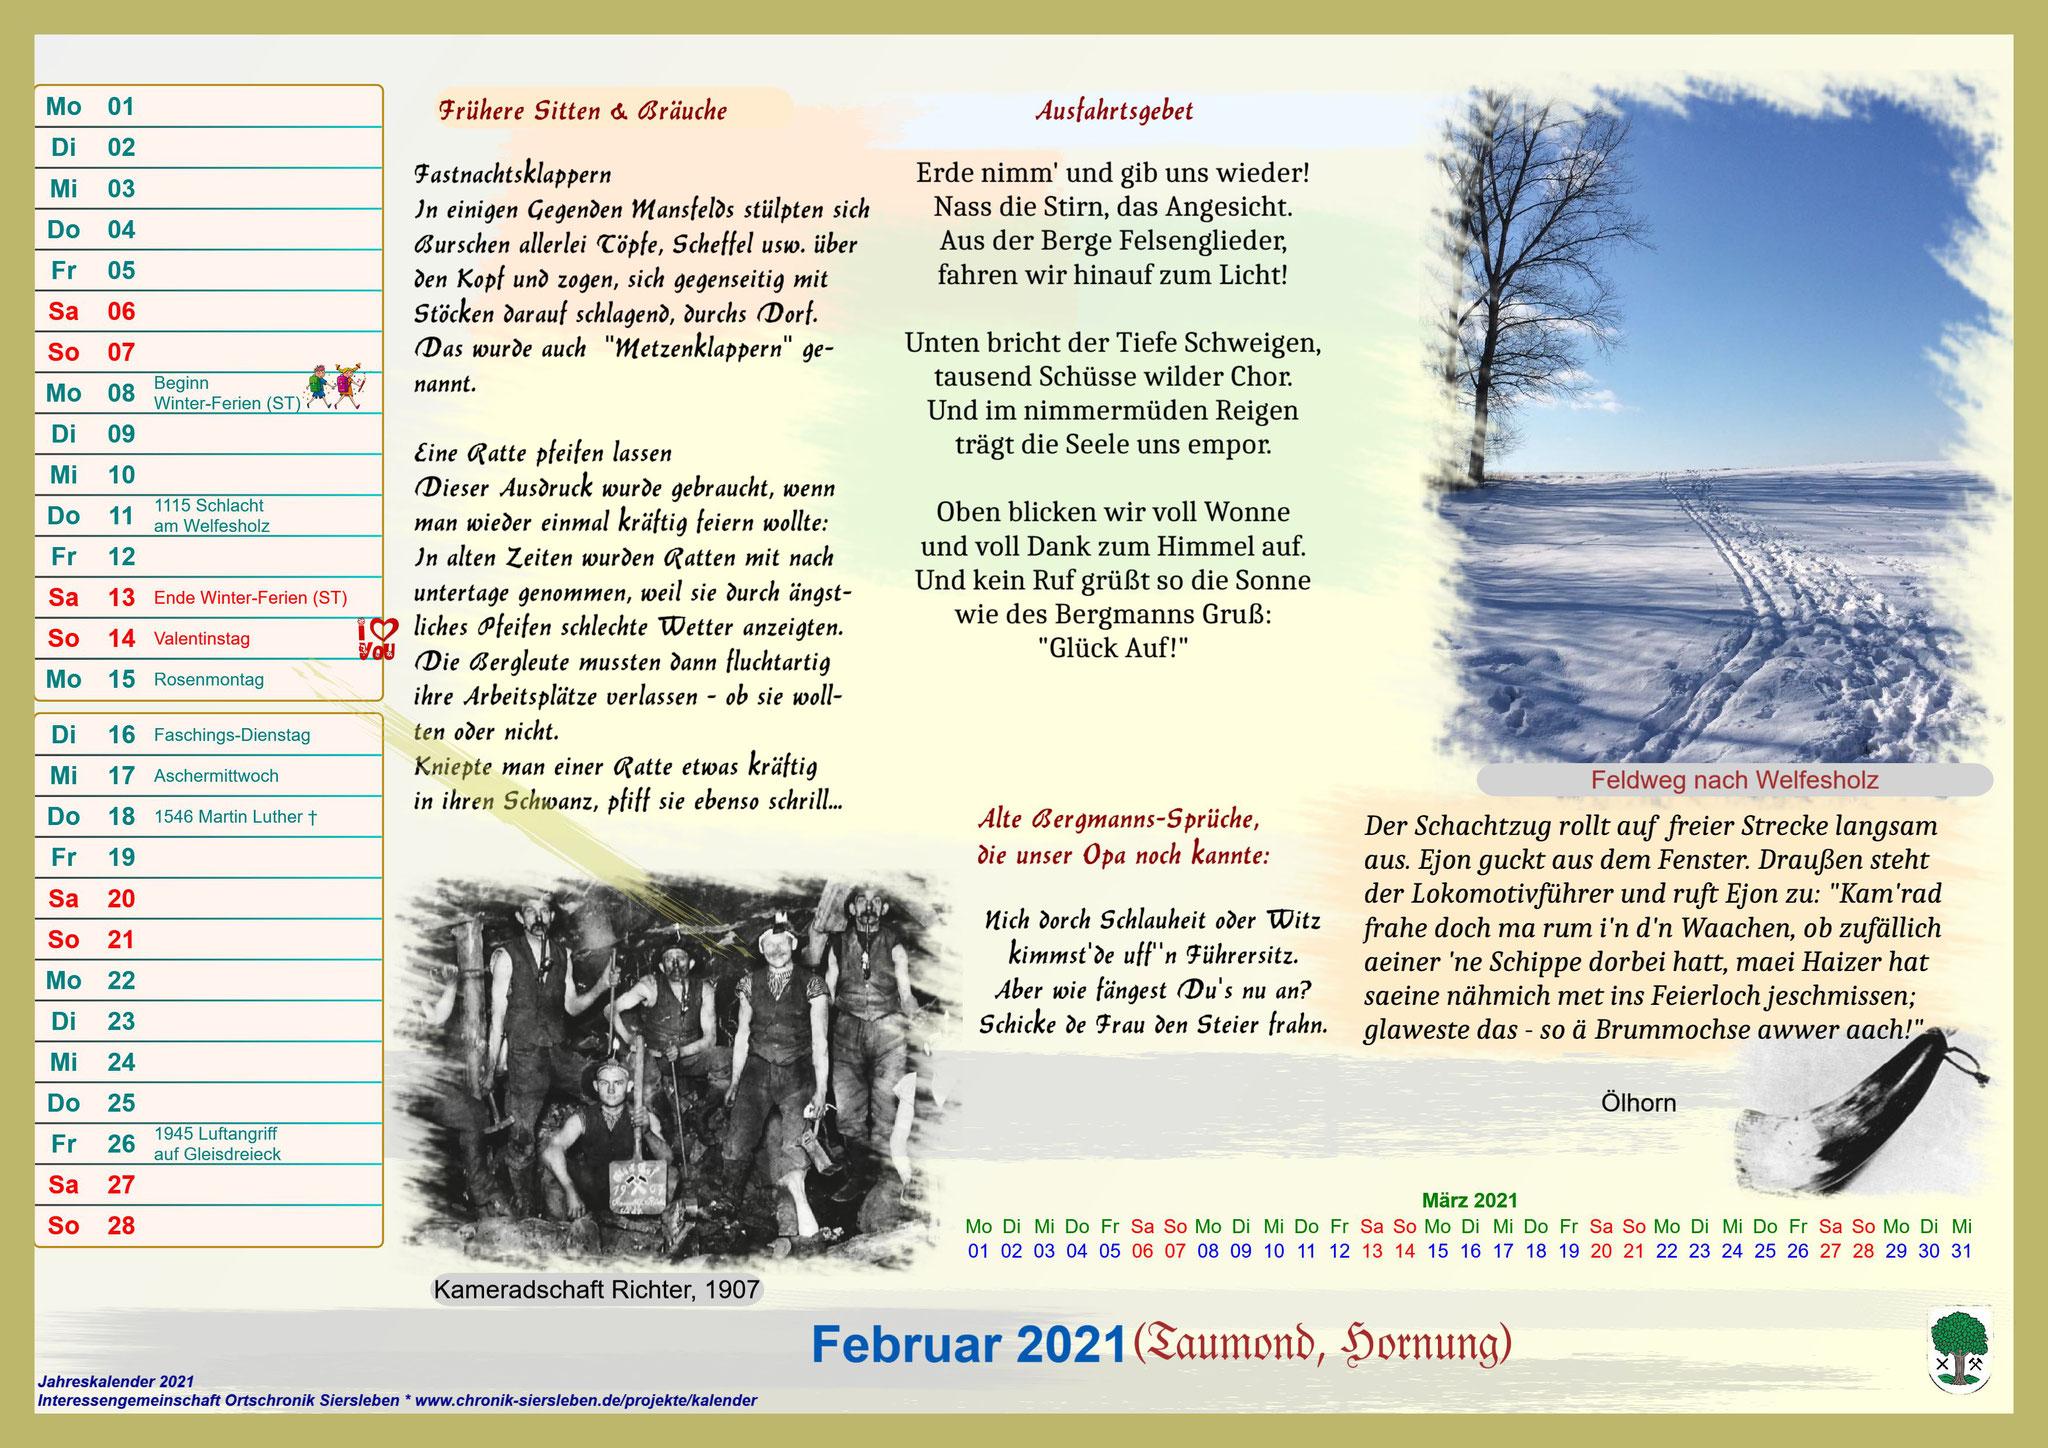 Jahreskalender 2021; Februar